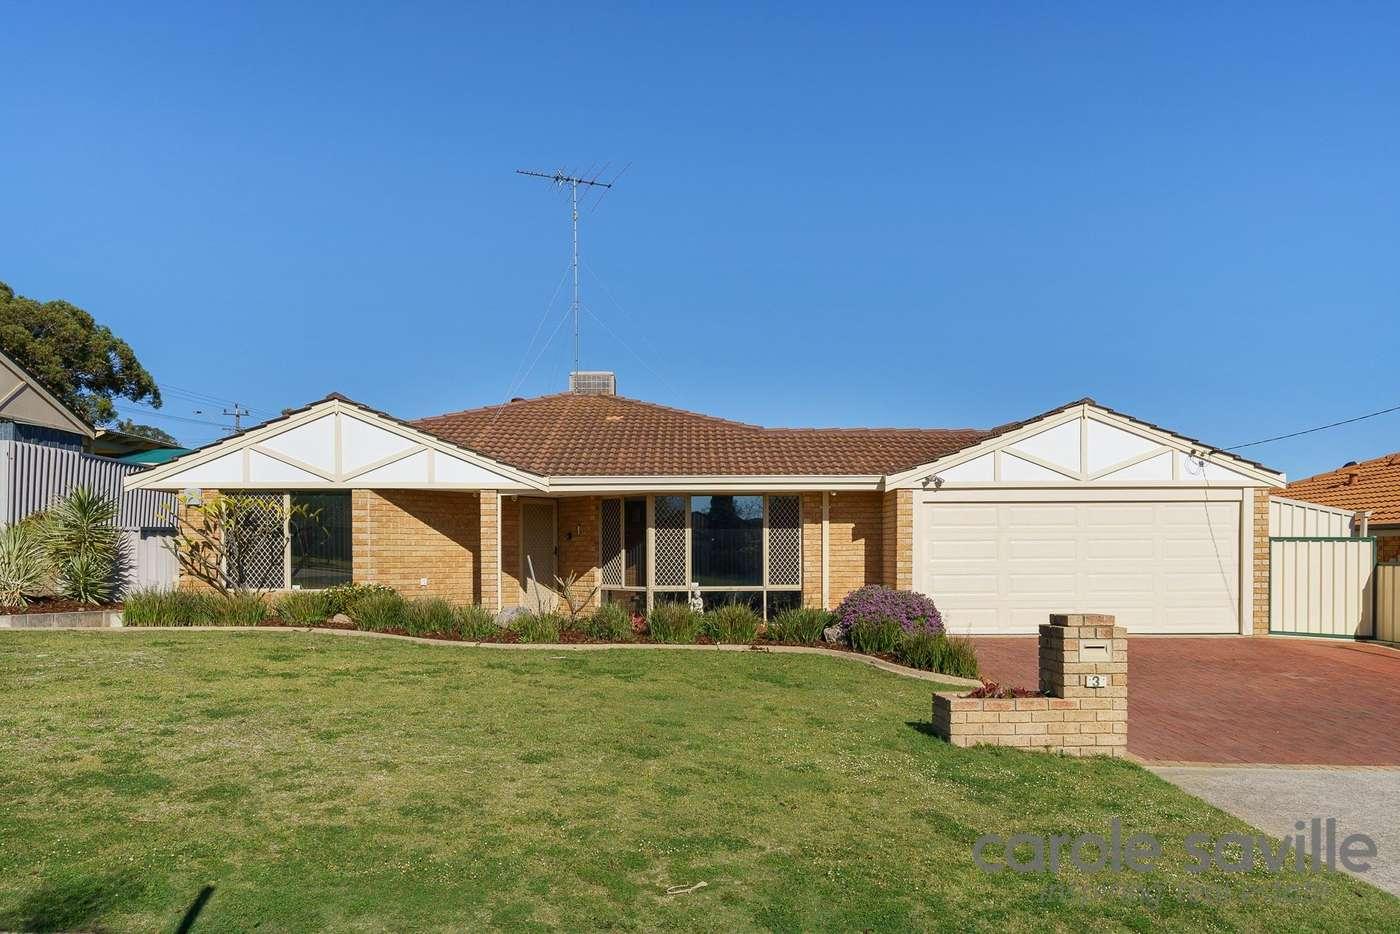 Main view of Homely house listing, 3 Haddington Street, Beldon WA 6027